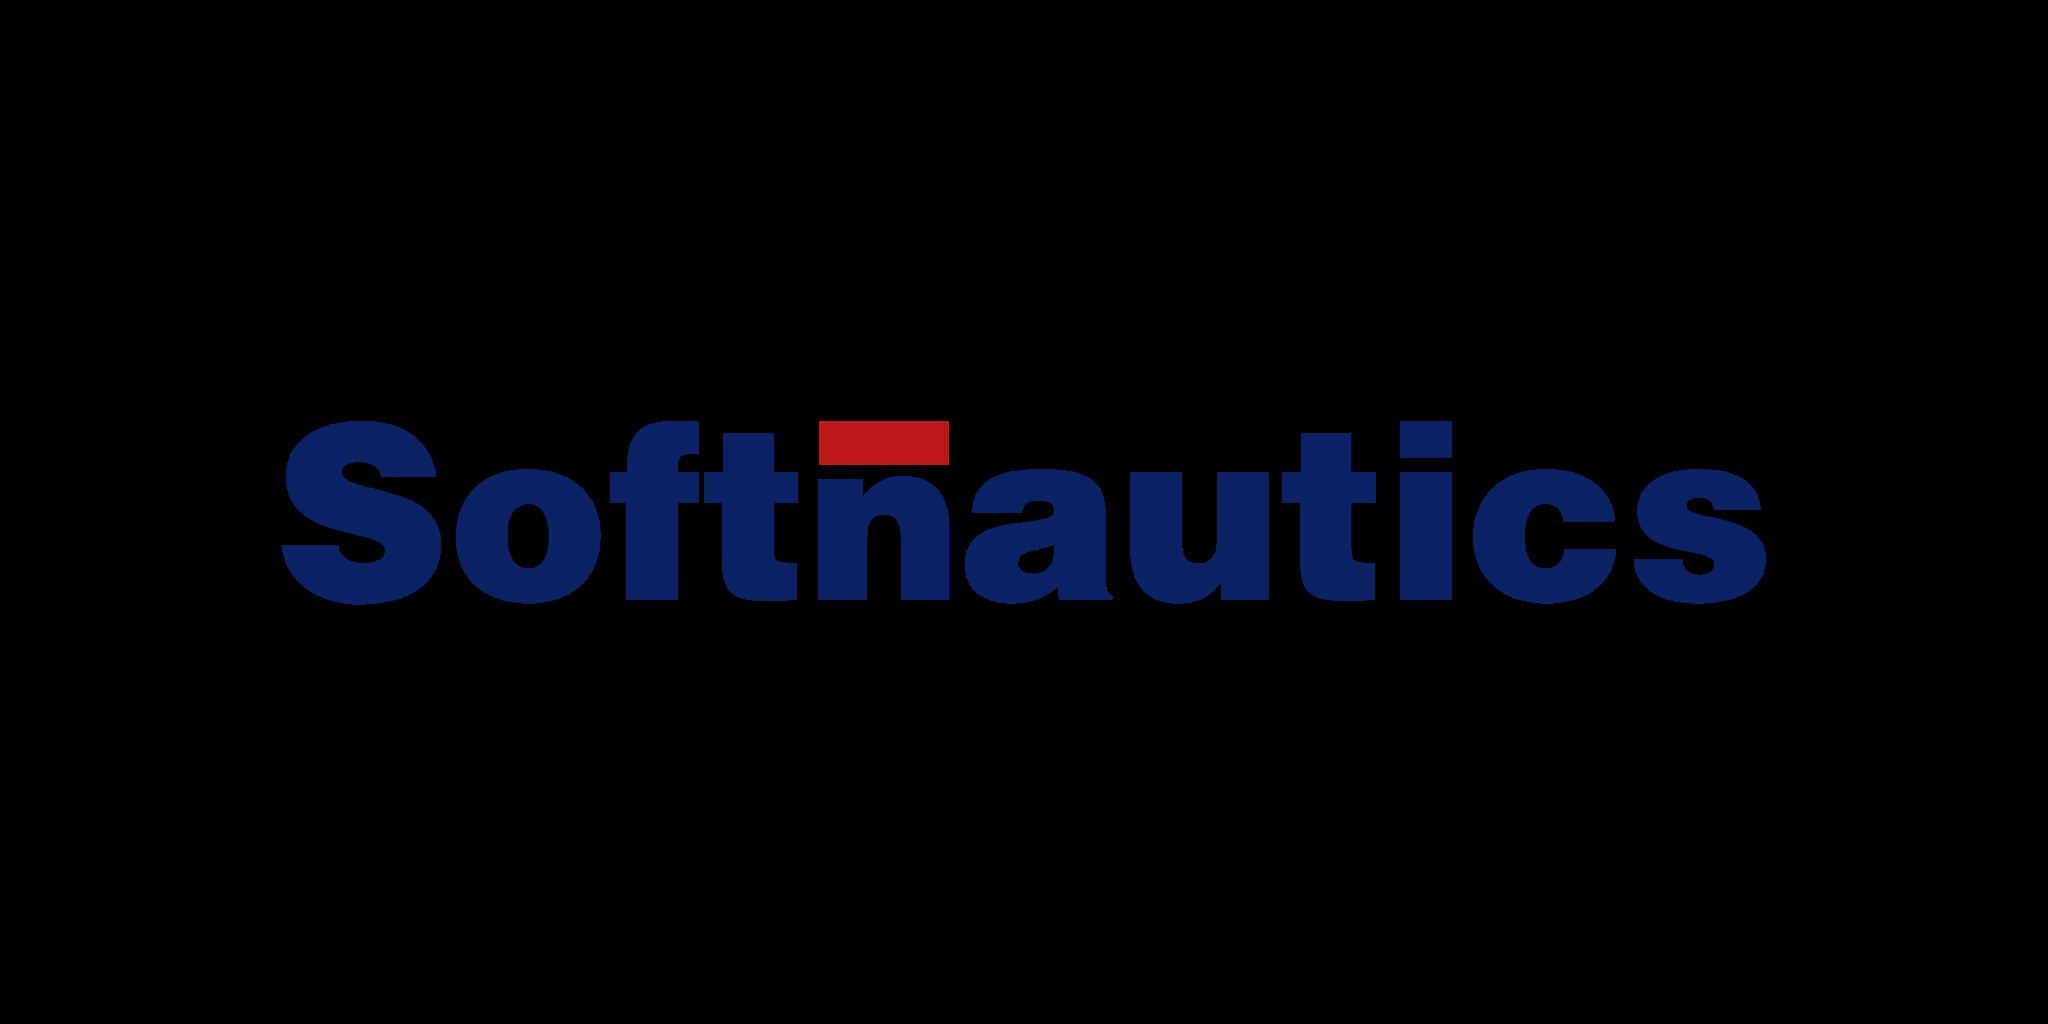 Softnautics Logo